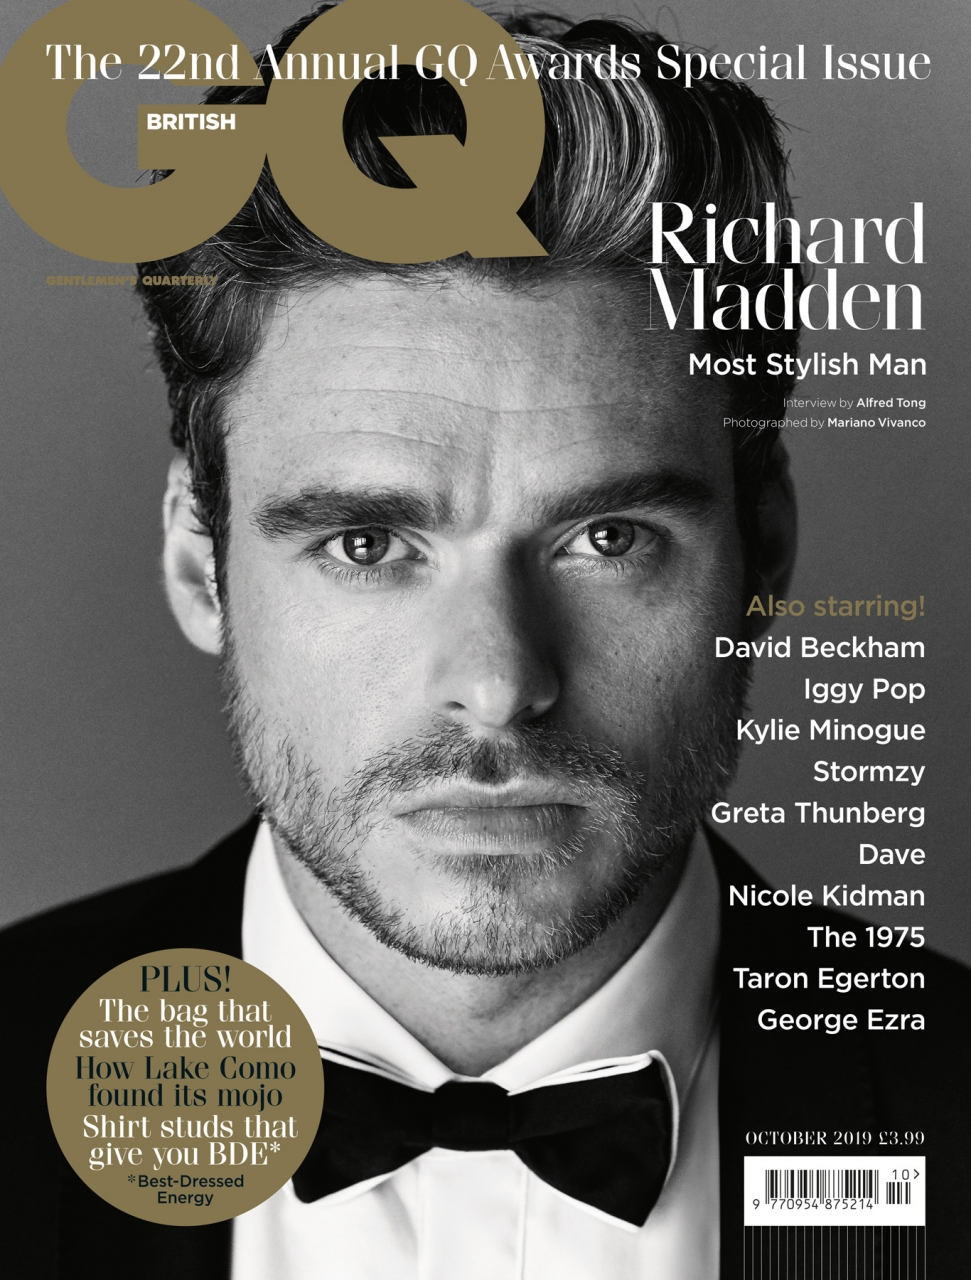 Hugo Boss Most Stylish Man - Richard Madden